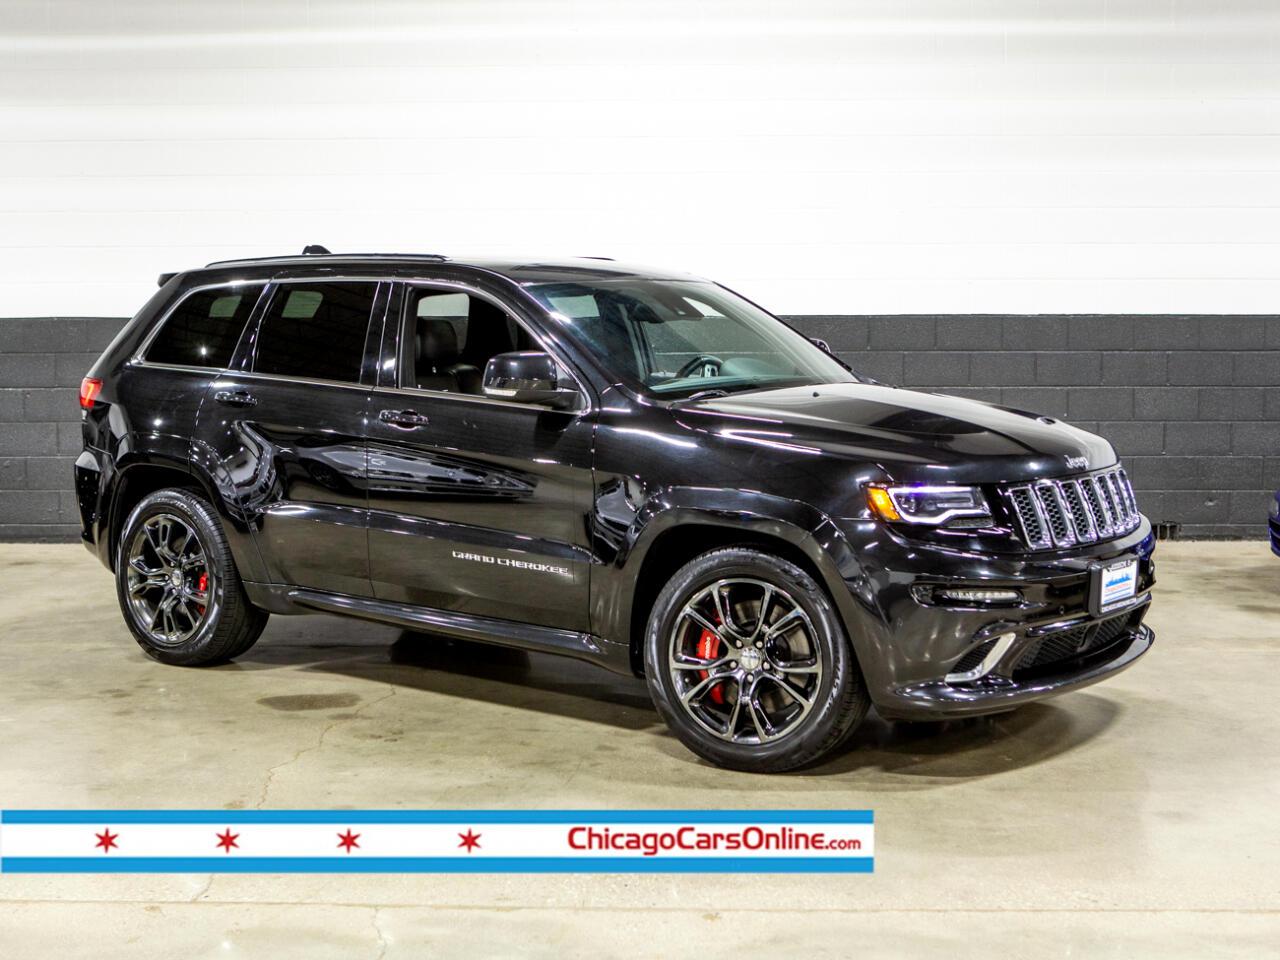 2015 Jeep Grand Cherokee SRT8 4WD